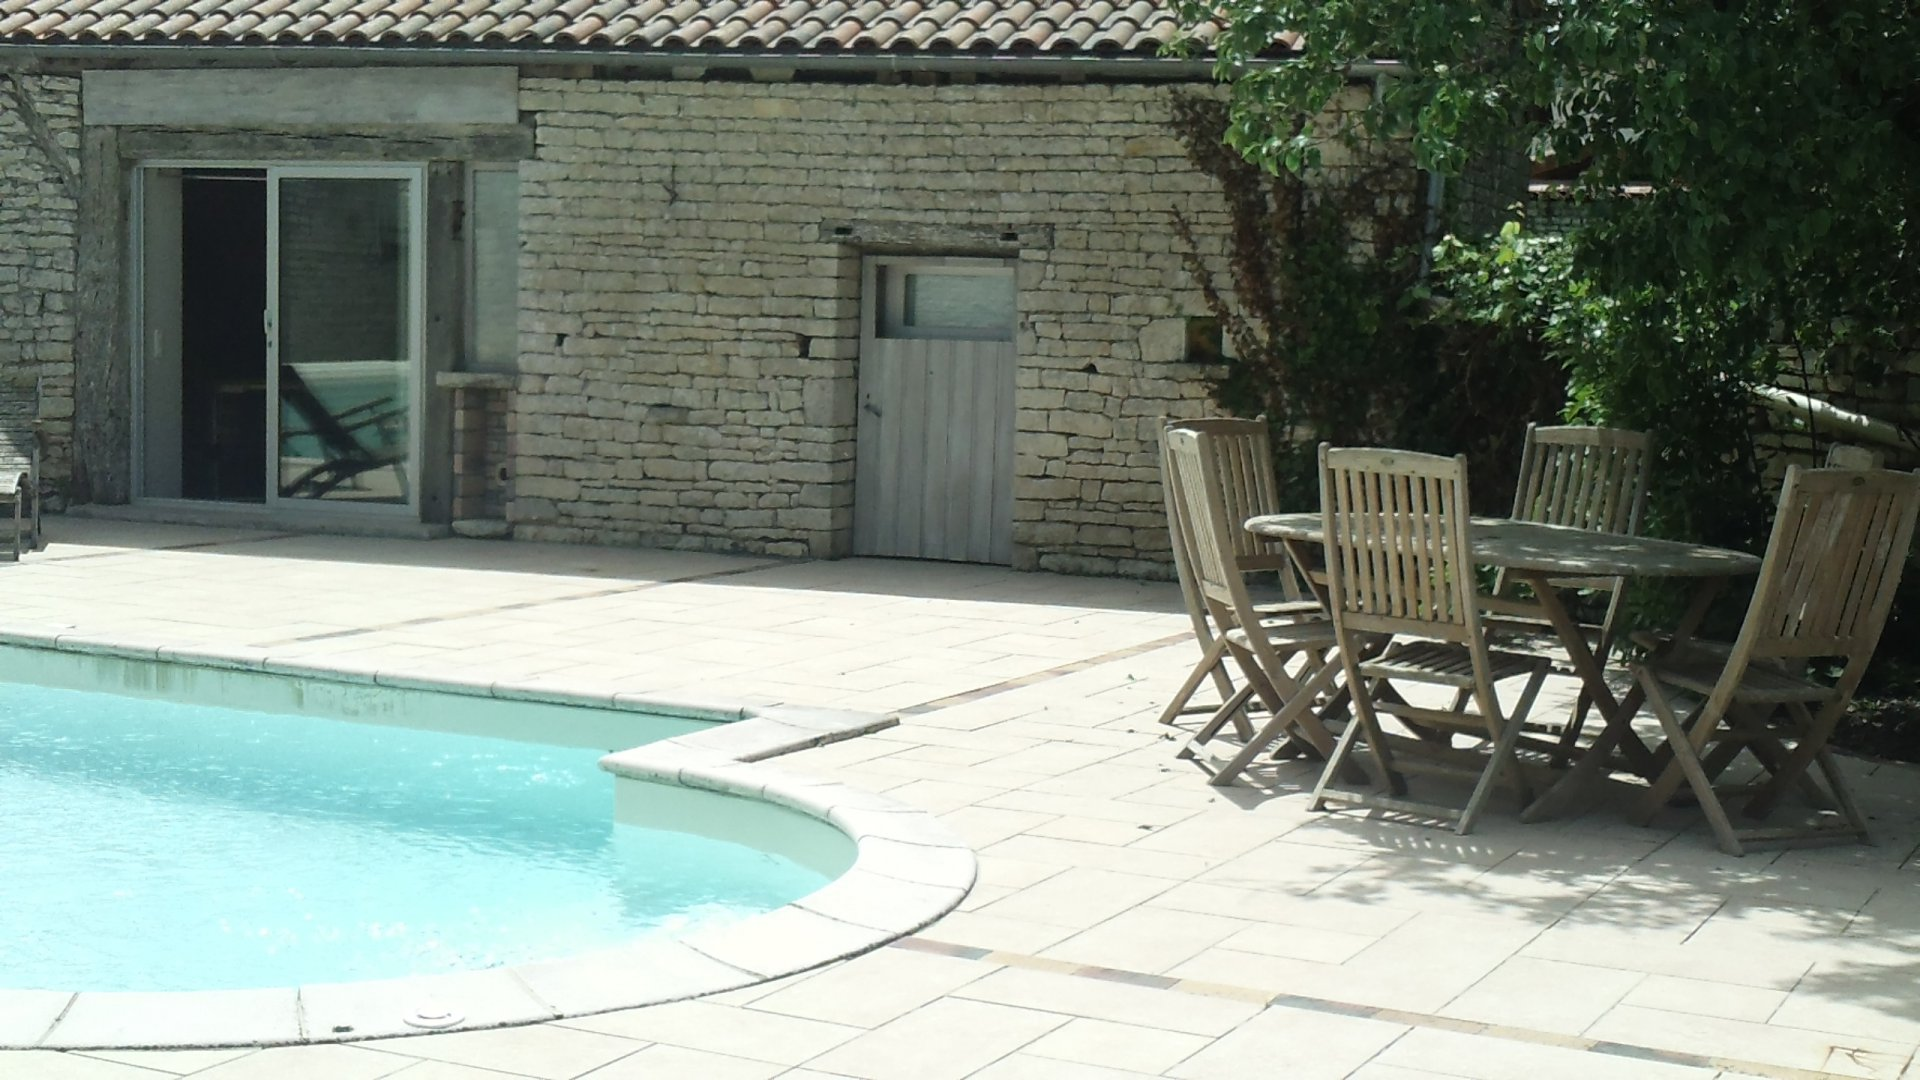 NANCLARS Maison en pierres avec piscine